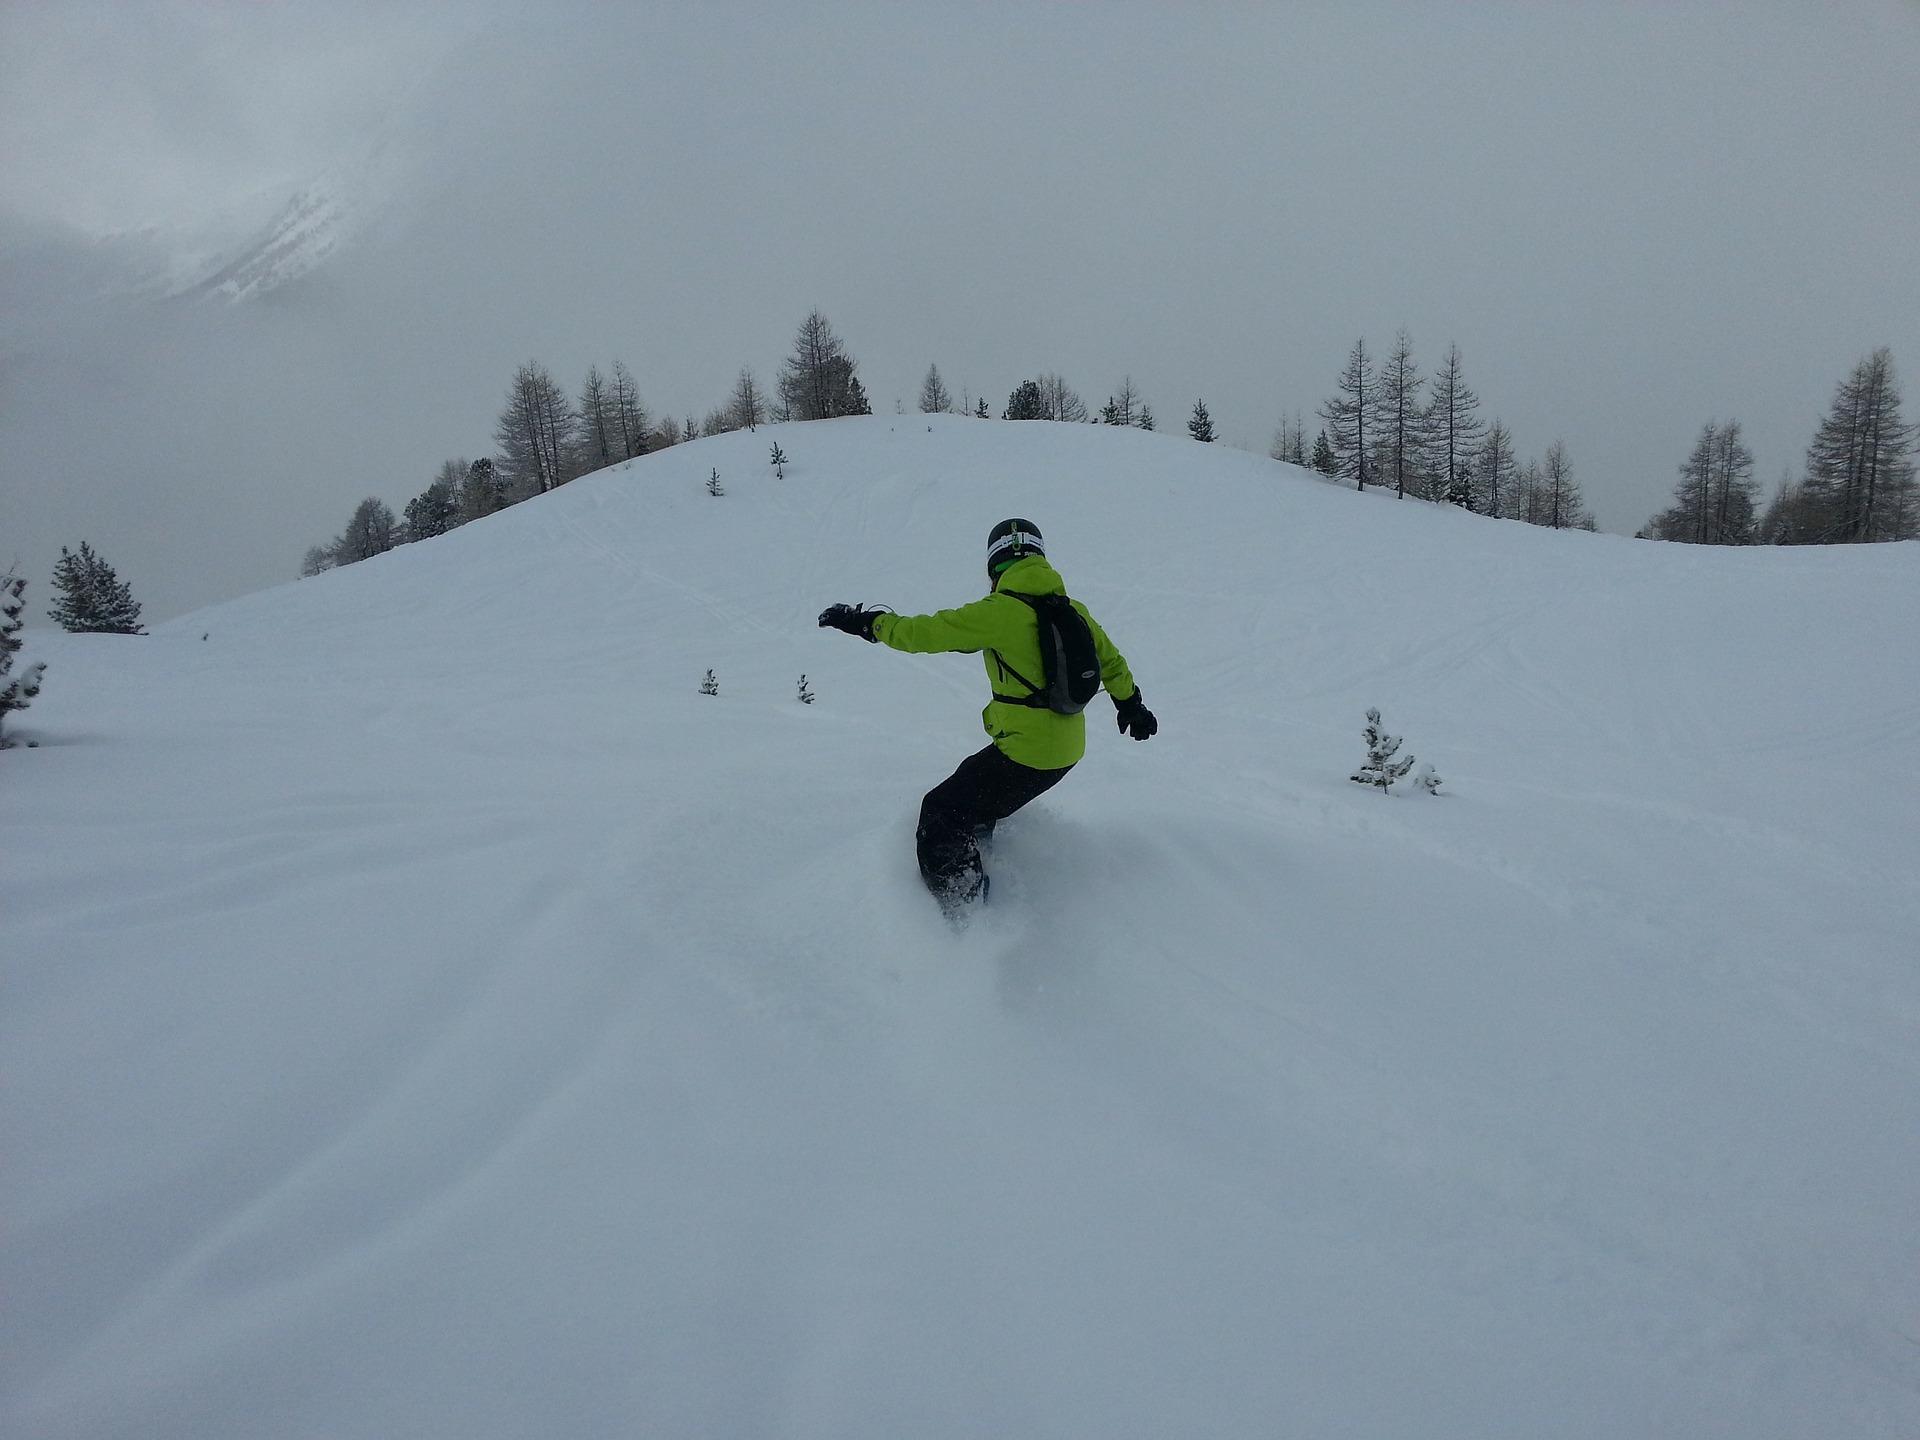 snowboard-170279_1920.jpg